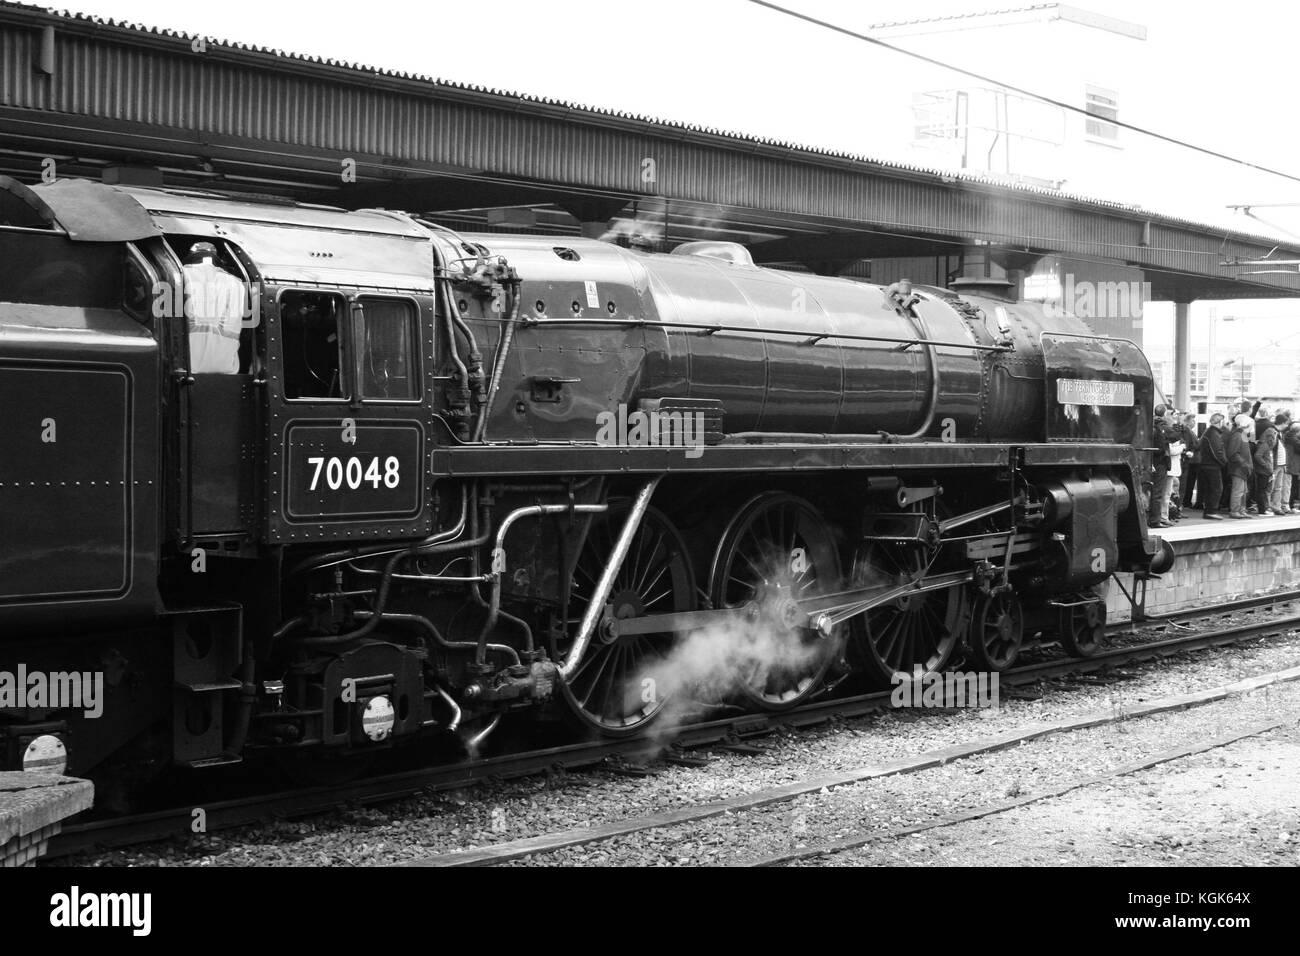 70048 at York - Stock Image